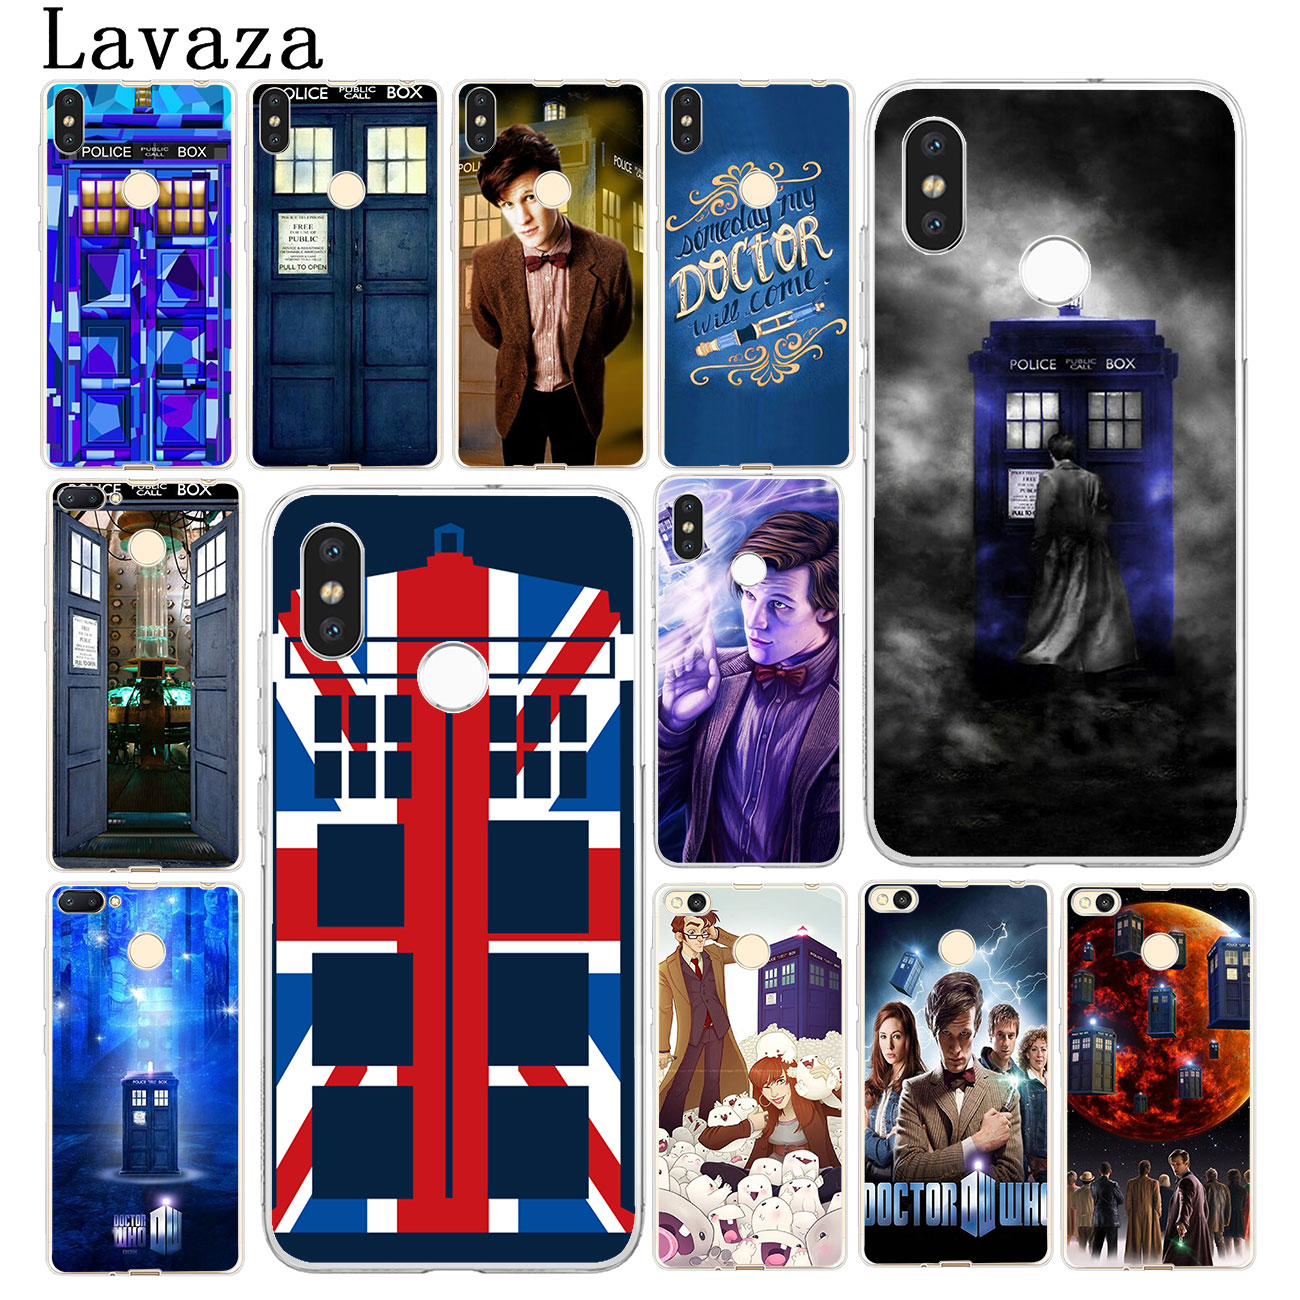 Able Lavaza Tardis Box Doctor Who Phone Shell Case For Xiaomi Mi 9 8 A2 Lite Se A1 Pocophone F1 6 6x 5s 5x Max 3 Mix 2s Cover Mi9 Mi8 Phone Bags & Cases